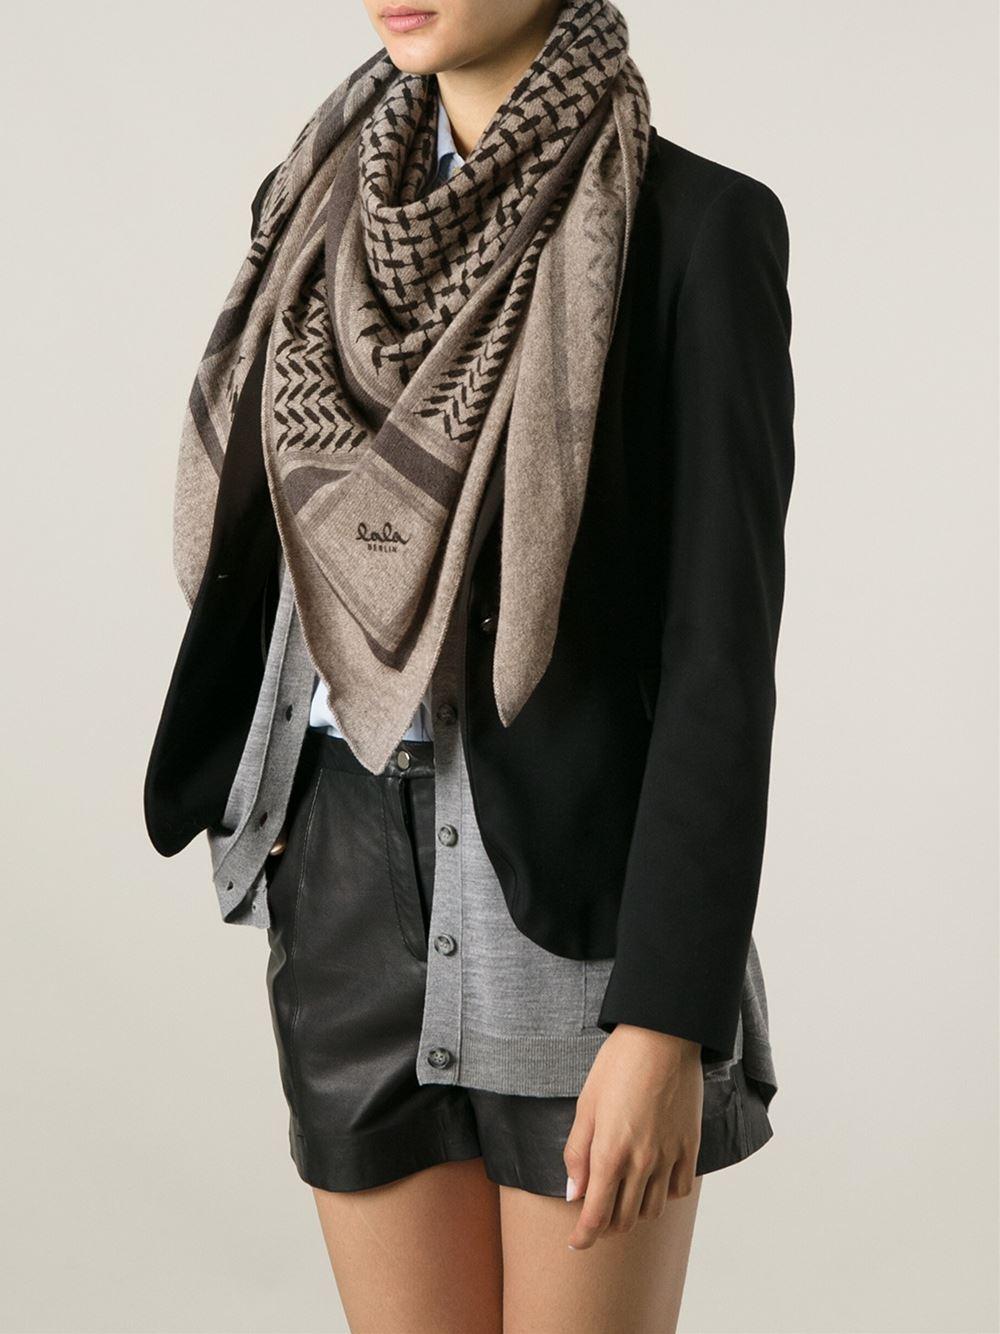 Lyst - Lala berlin Trinity Knit Triangle Scarf in Brown